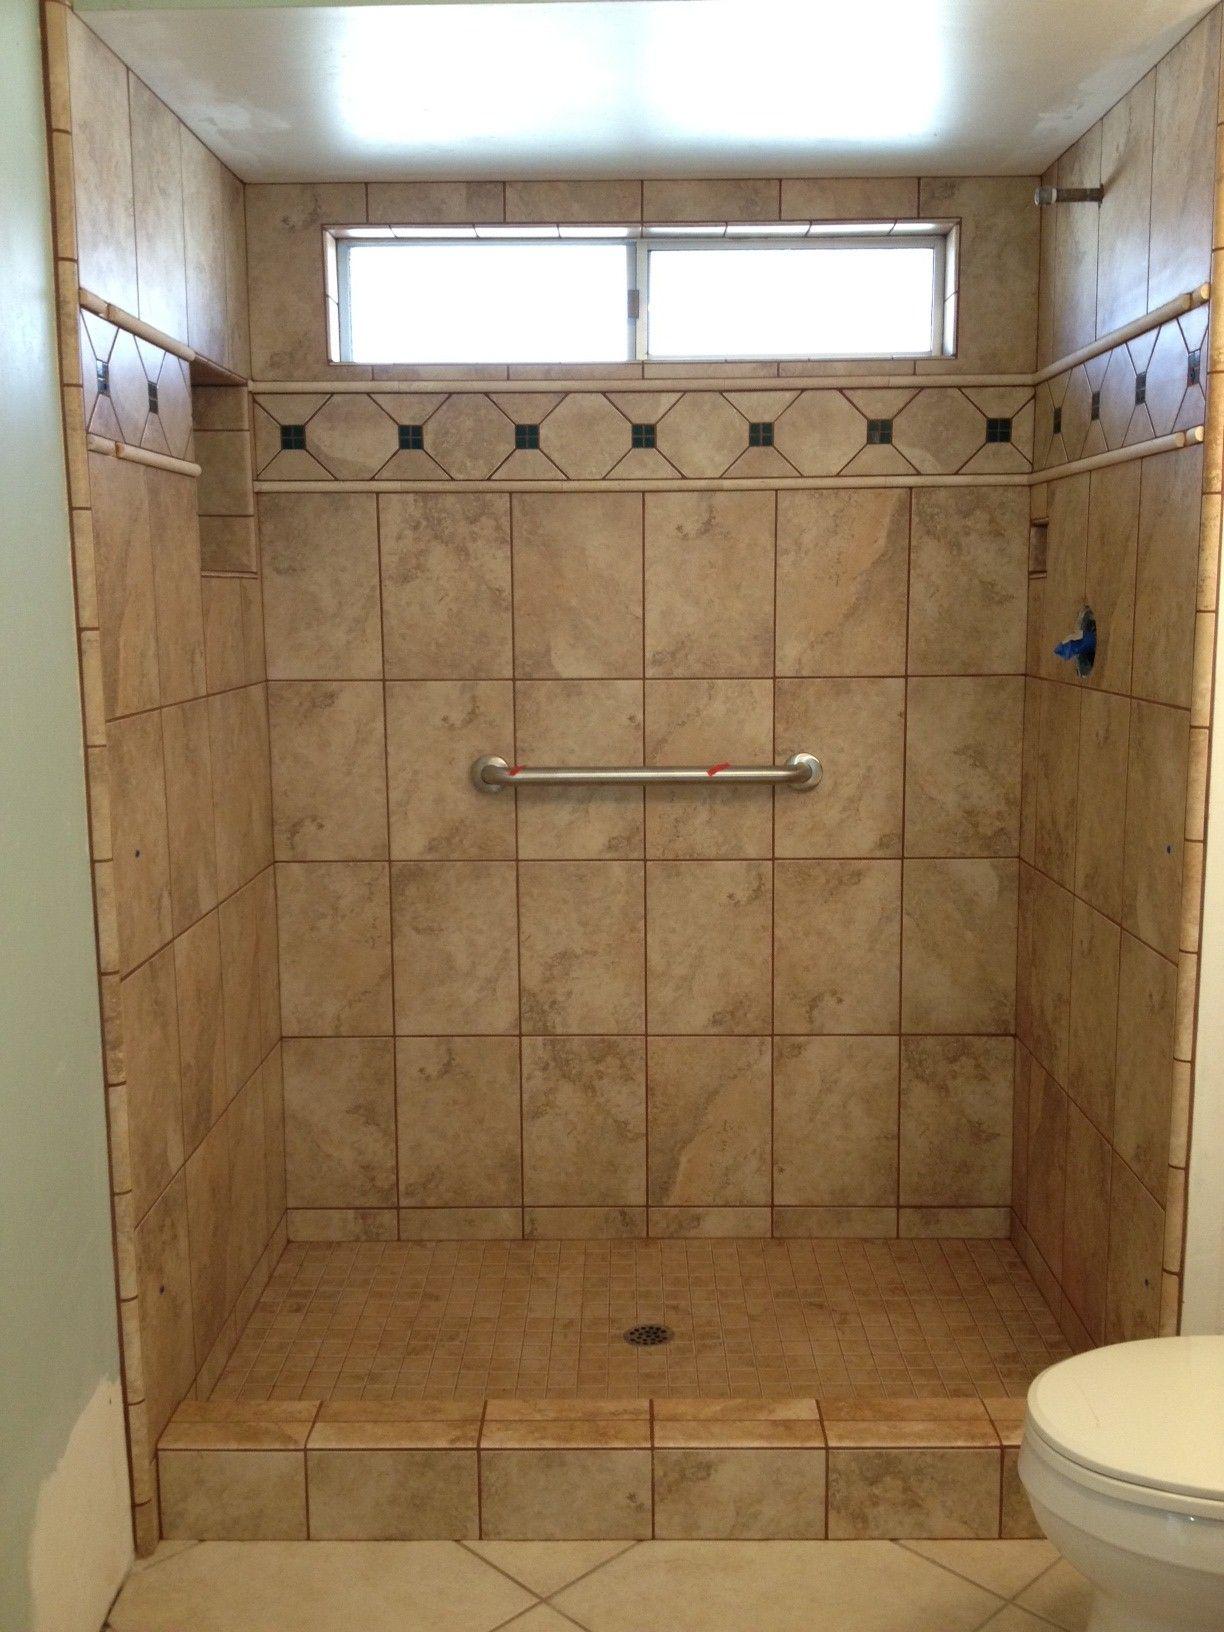 Photos of tiled shower stalls photos gallery custom tile work co ceramic